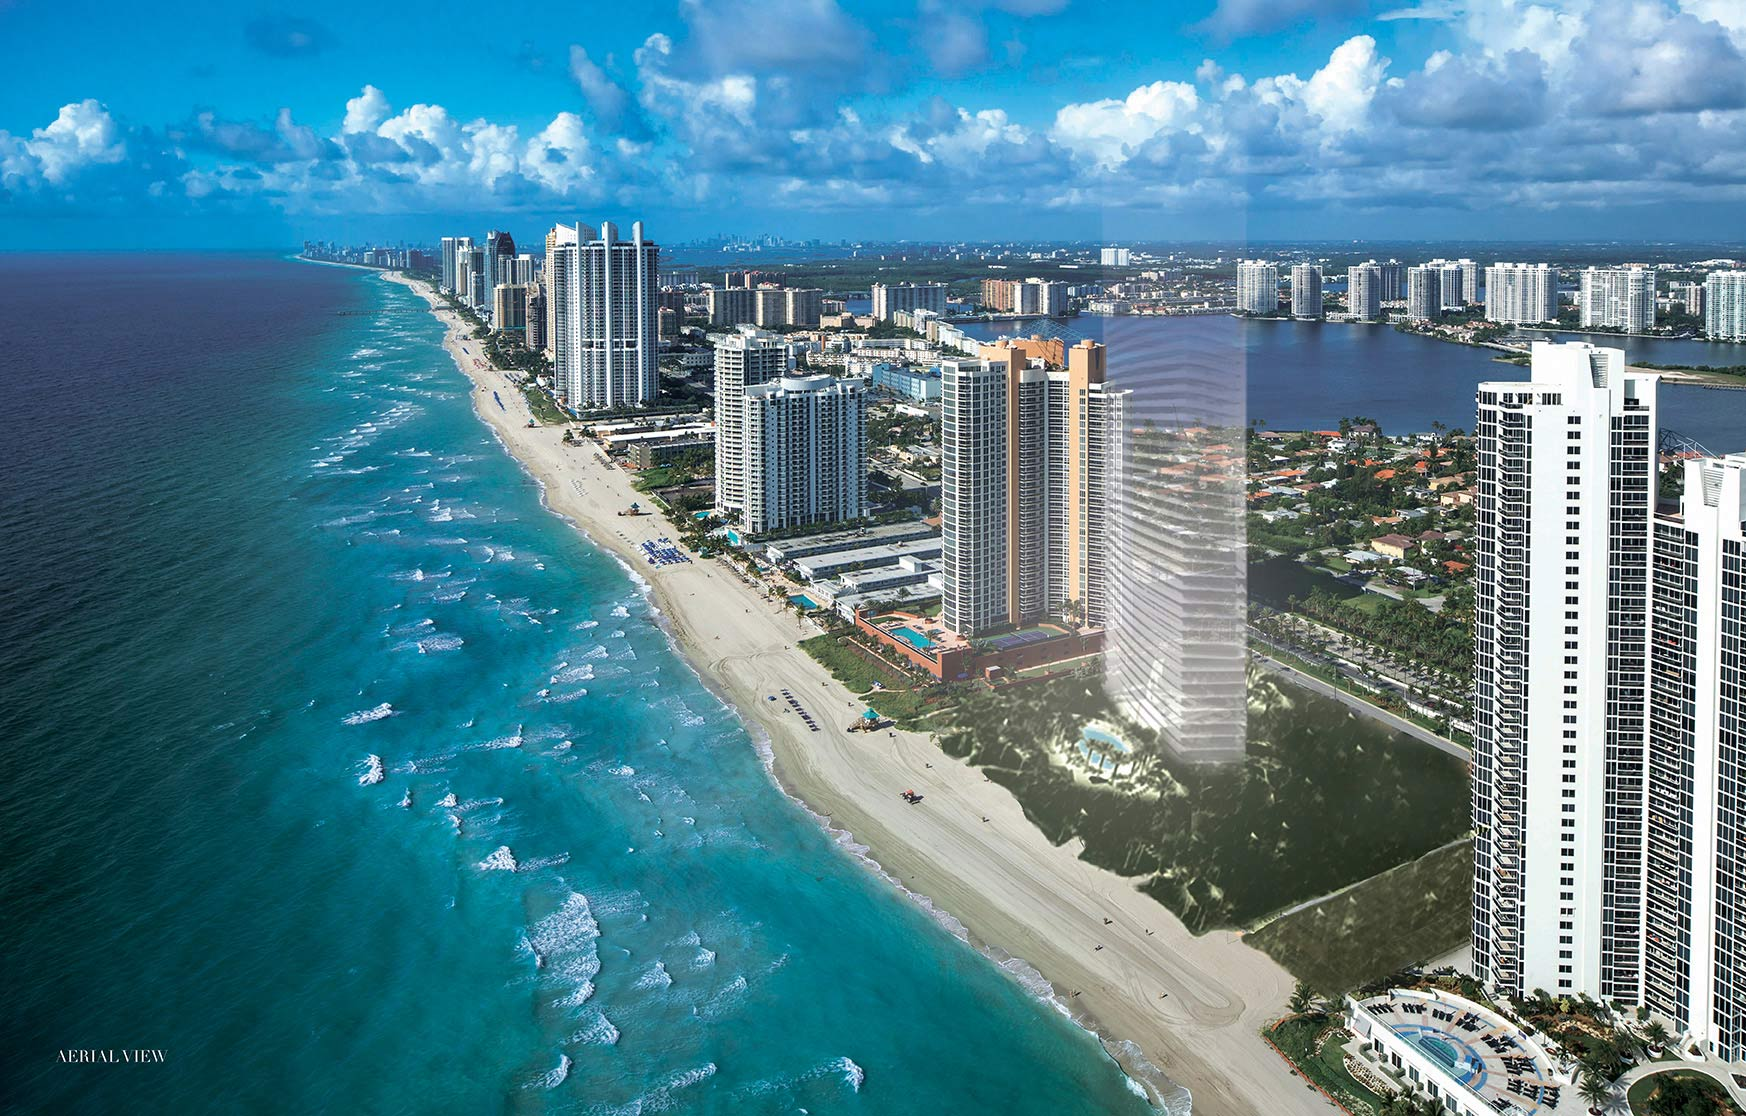 portugues,Imobiliario de miami,miami news,miami corretor de imoveis,brickell imobiliario,miami beach imobiliario